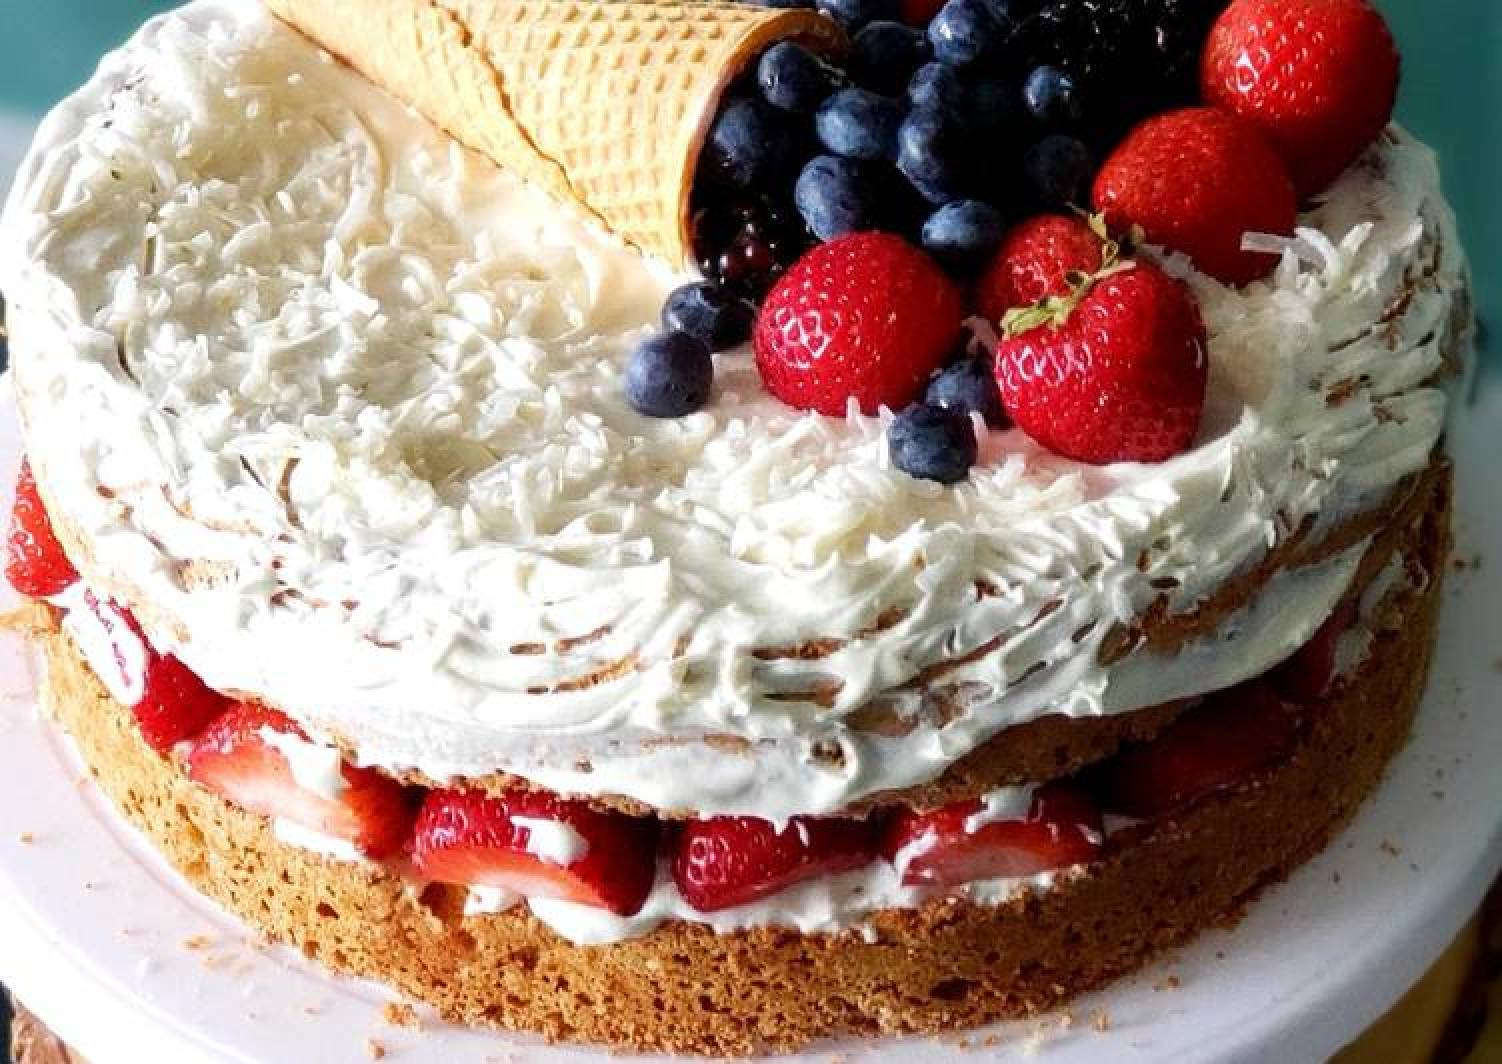 Berries & Cream Sponge Cake